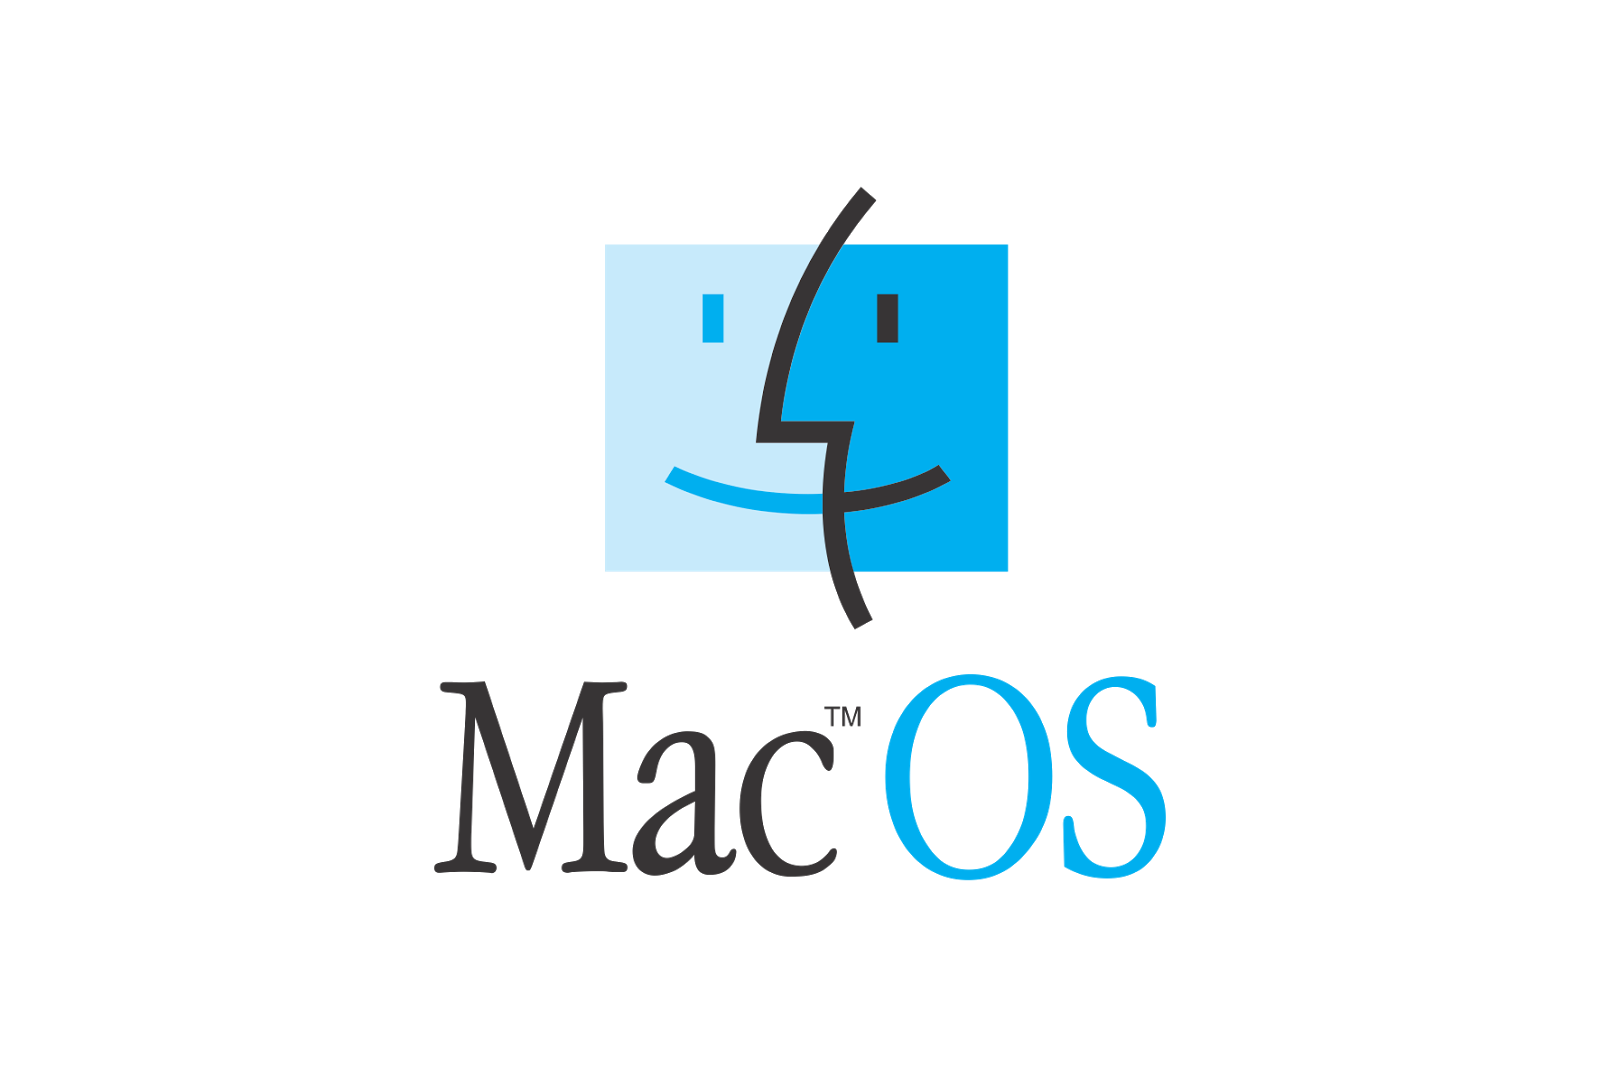 mac os logo old style